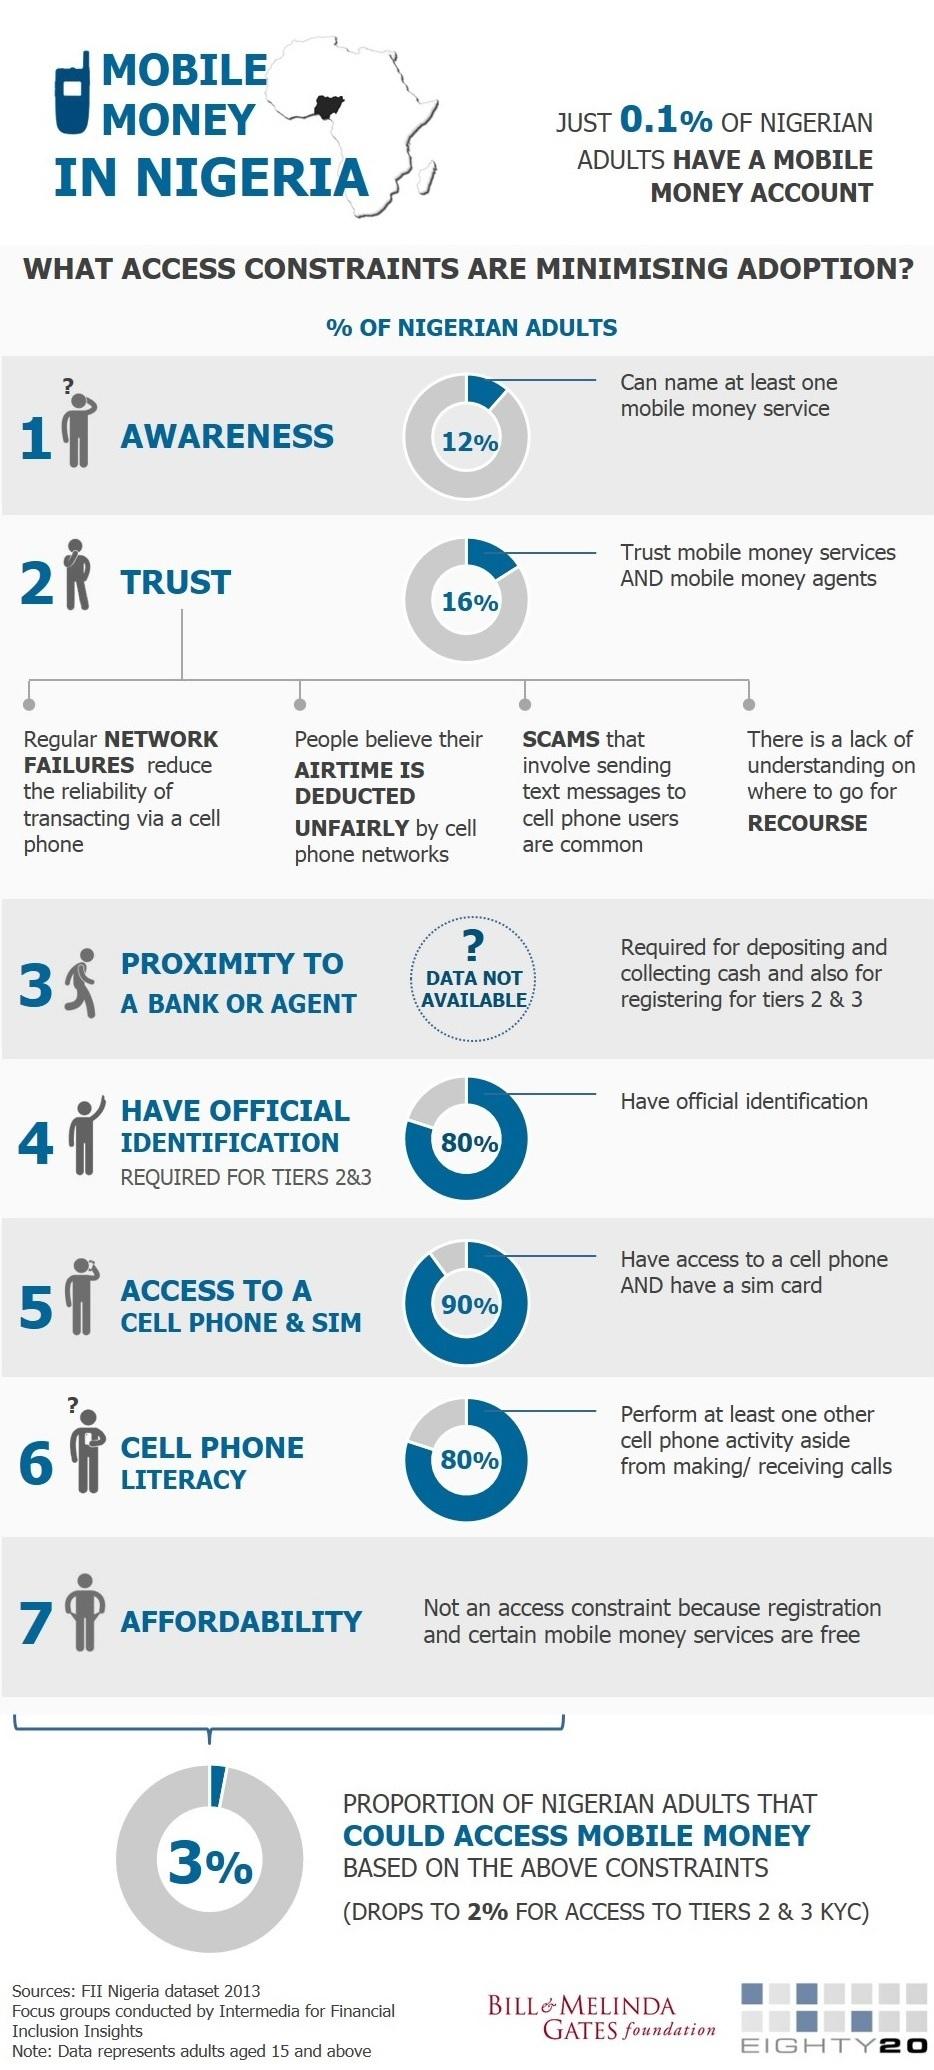 Mobile Money in Nigeria_Access Constraints